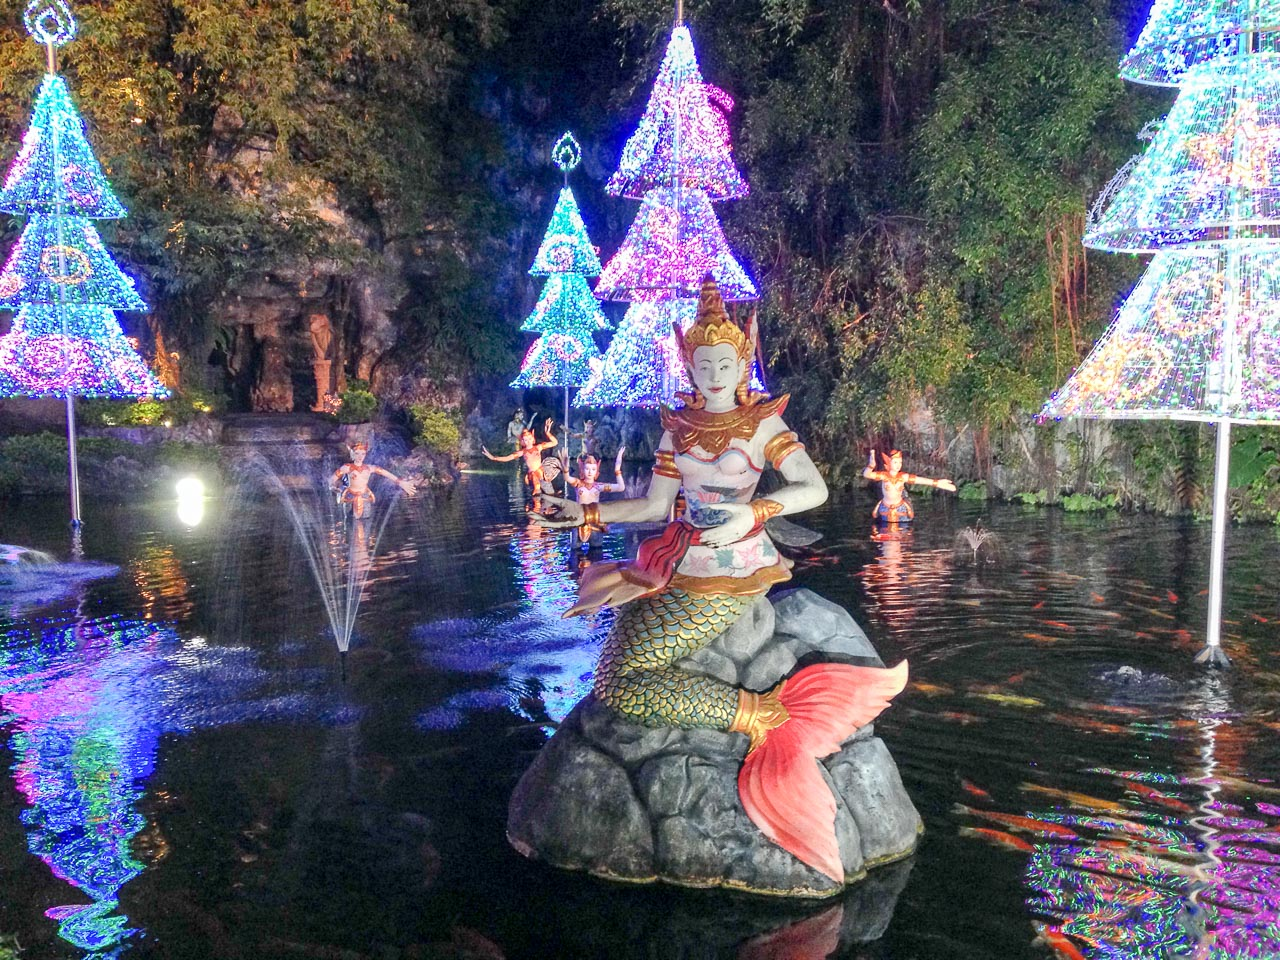 mermaid pond at christmas / kamala beach, thailand